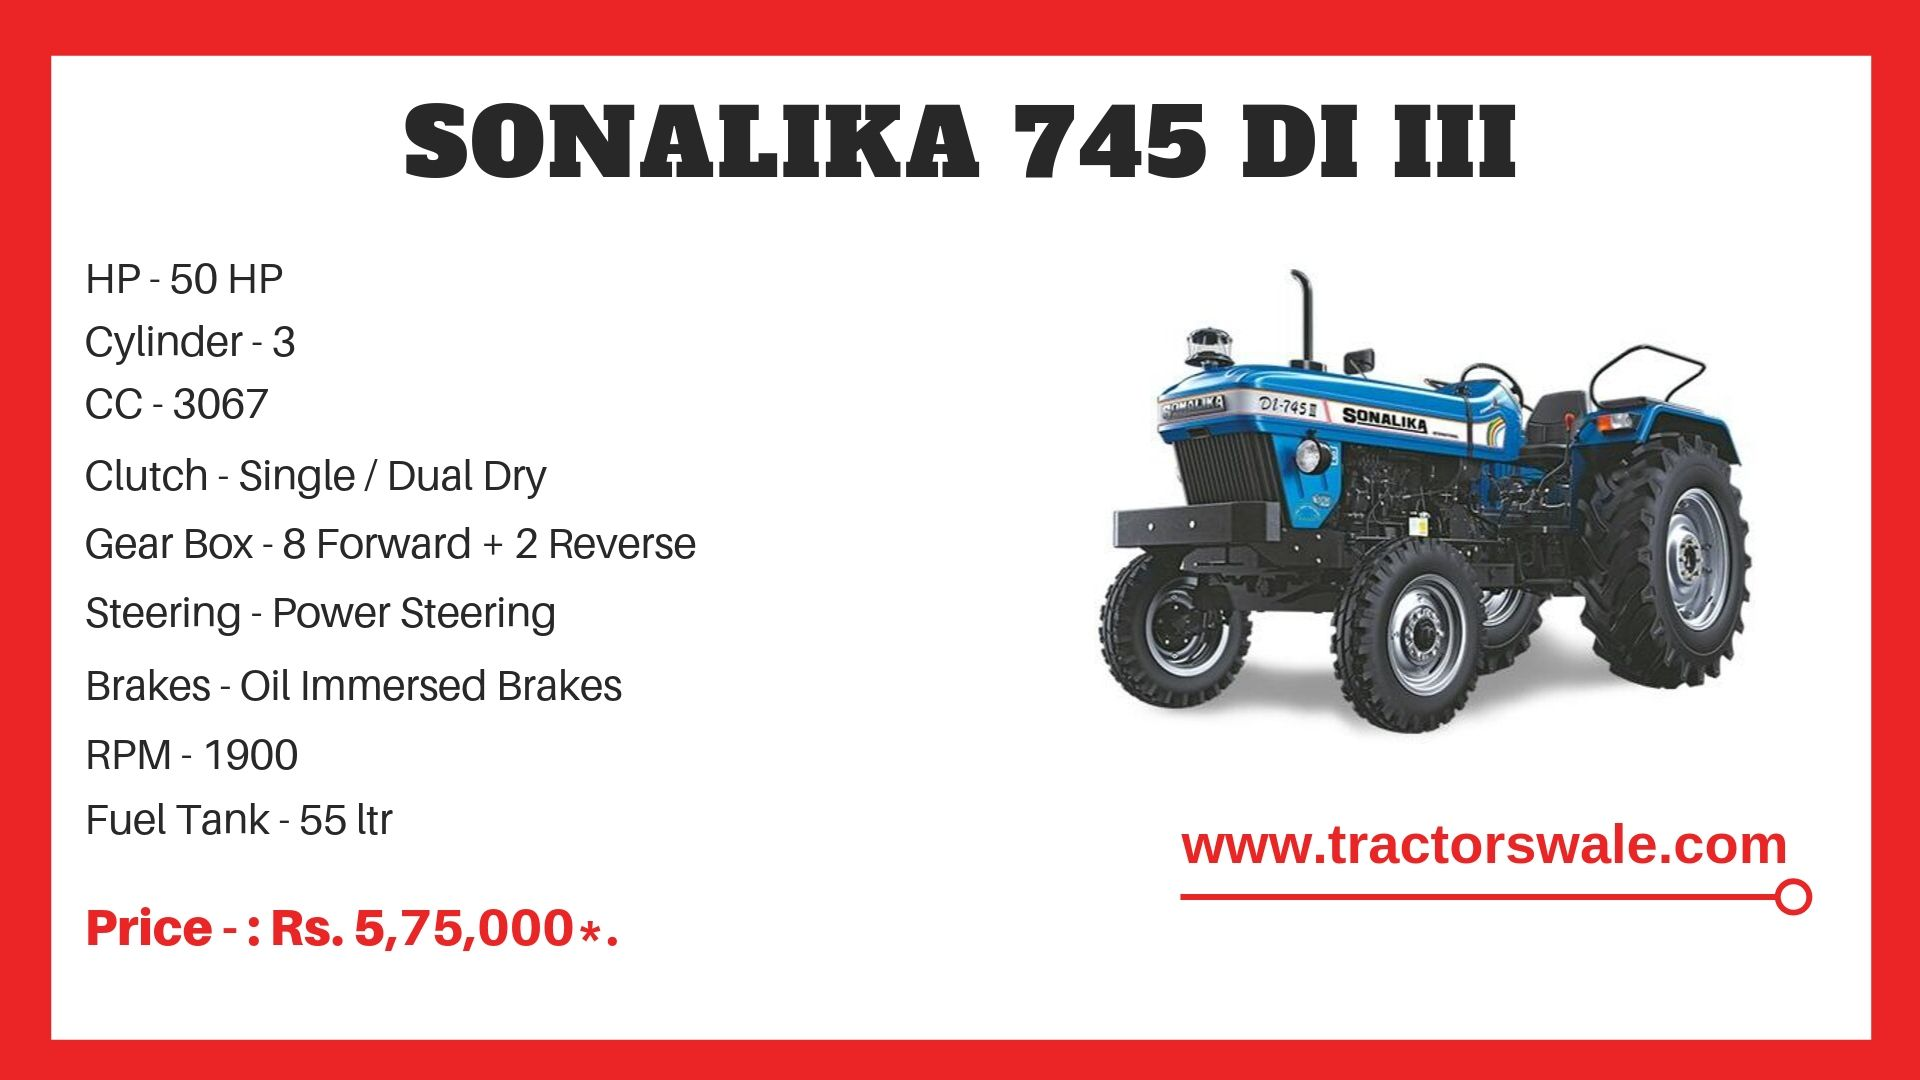 Sonalika 745 DI III tractor specifications